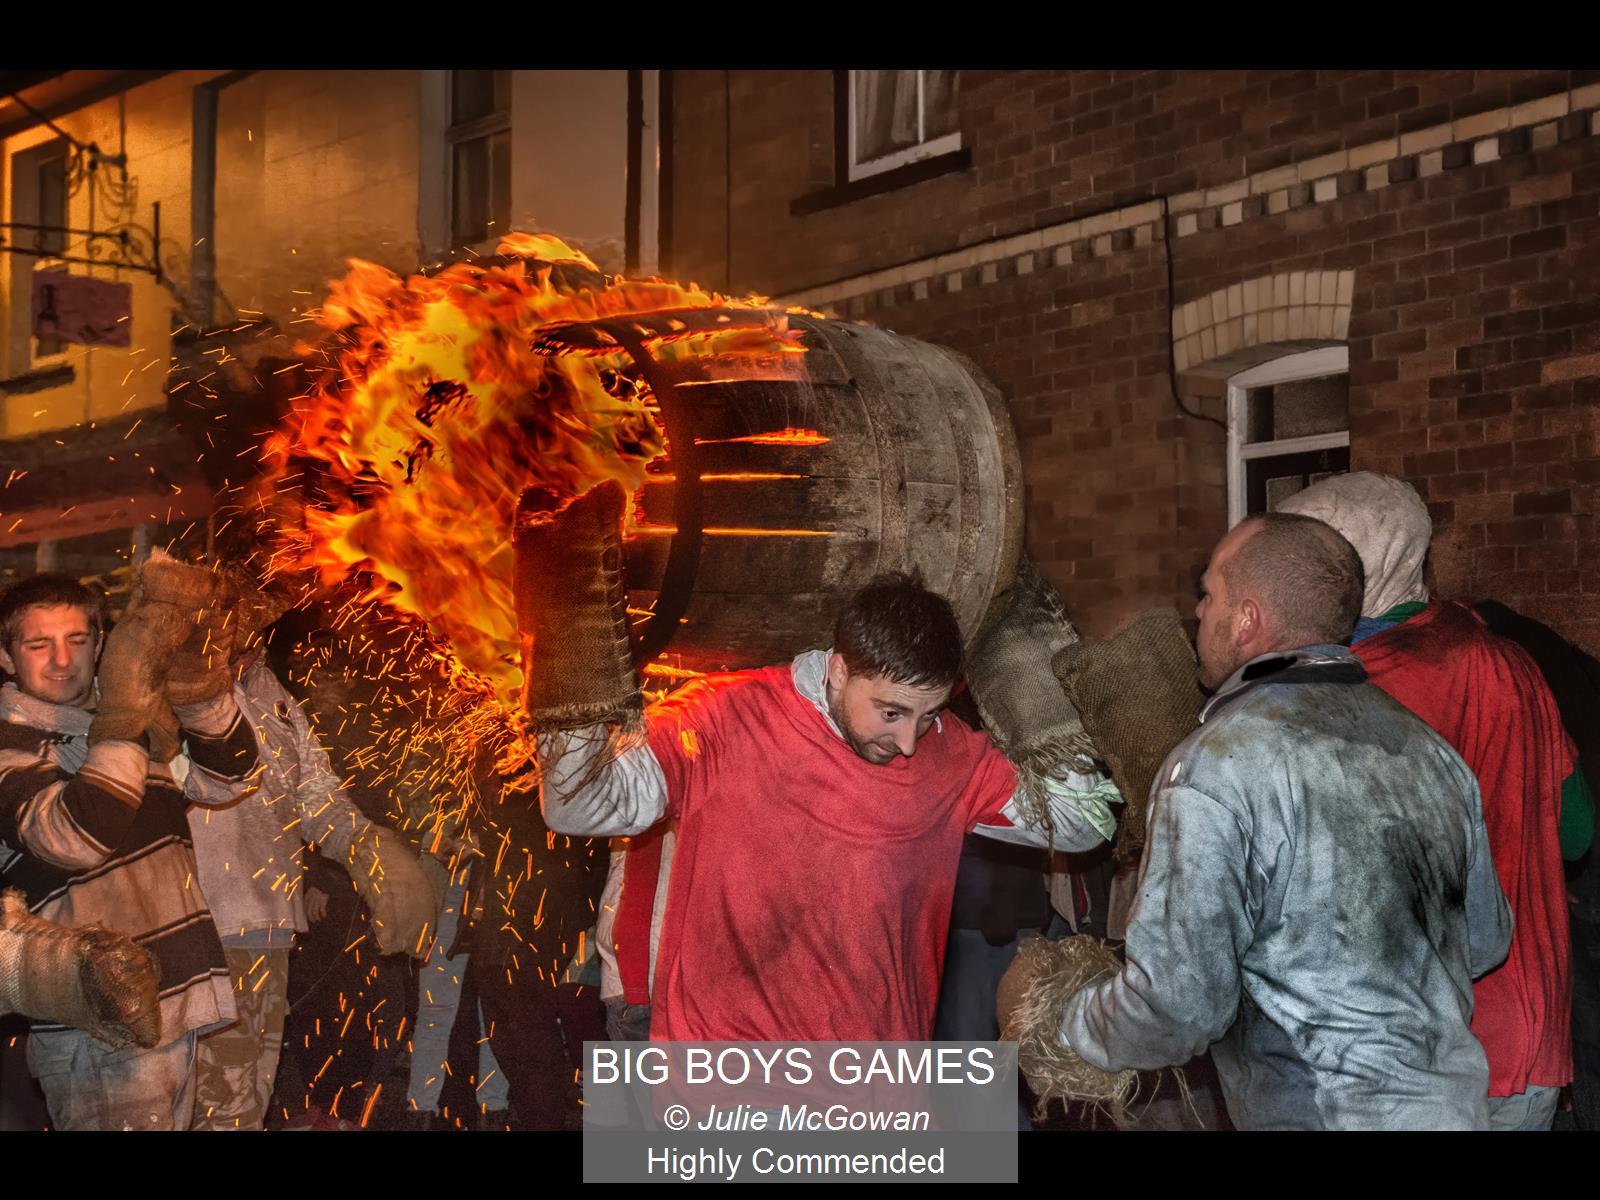 Julie McGowan_BIG BOYS GAMES_HComm